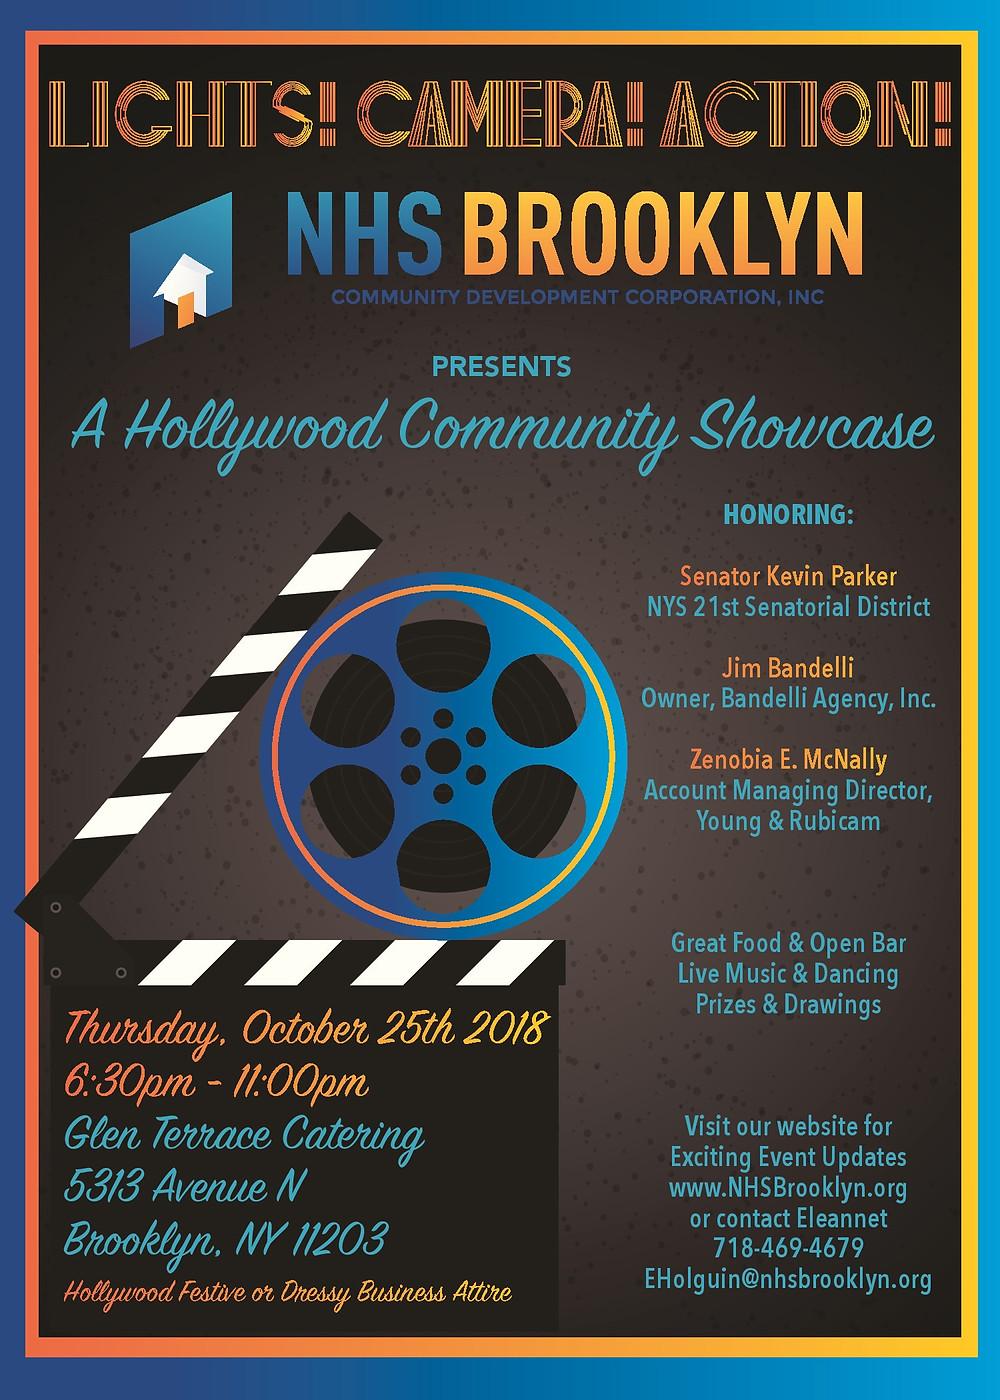 NHS Brooklyn Annual Community Showcase October 2018 Glen Terrace